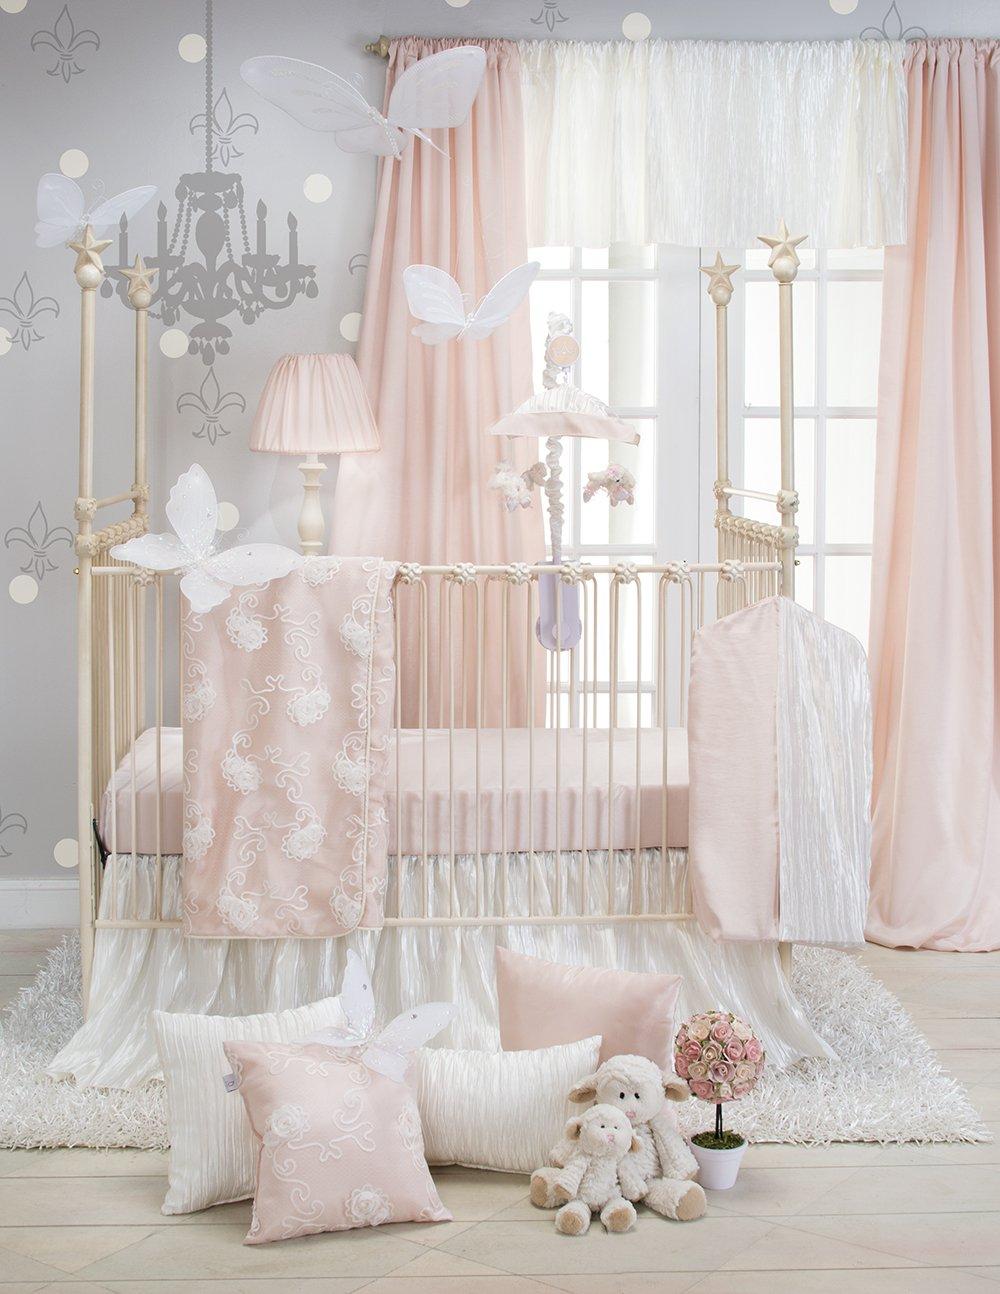 Crib Bedding Set Baby Girl Nursery 3 Piece Pink Newborn